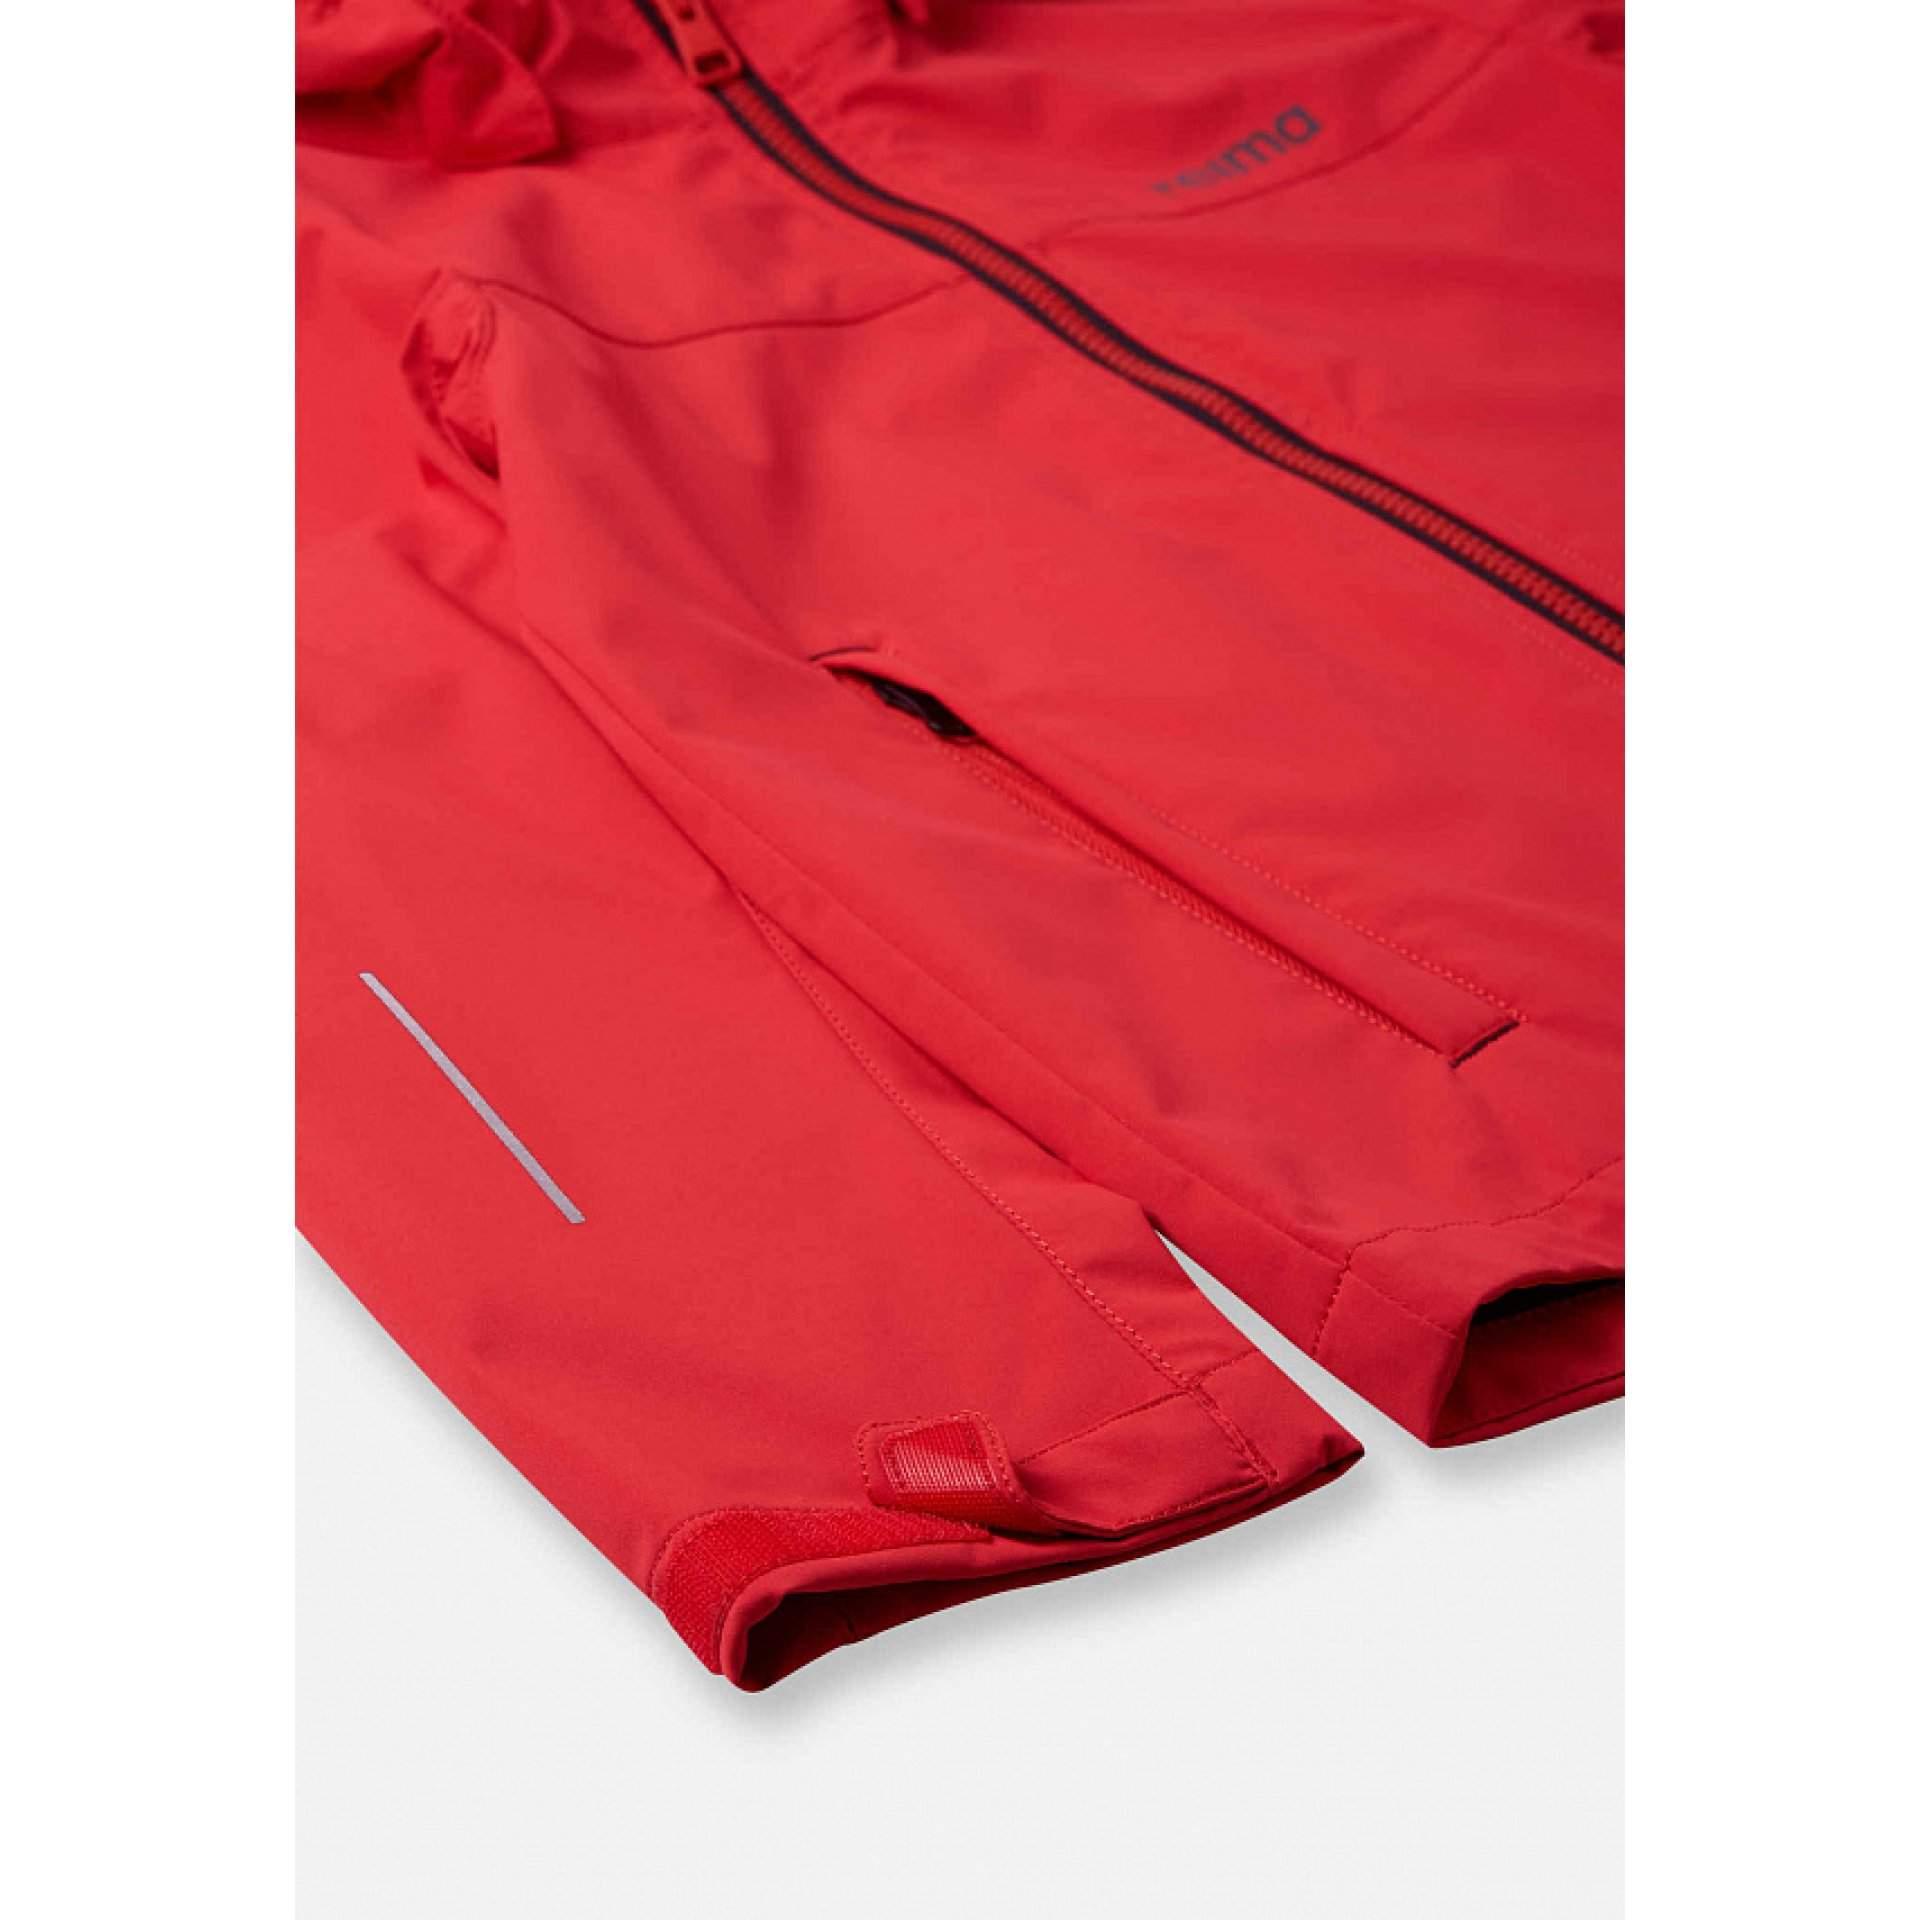 KURTKA REIMA KUOPIO 531509-3880 TOMATO RED MANKIET